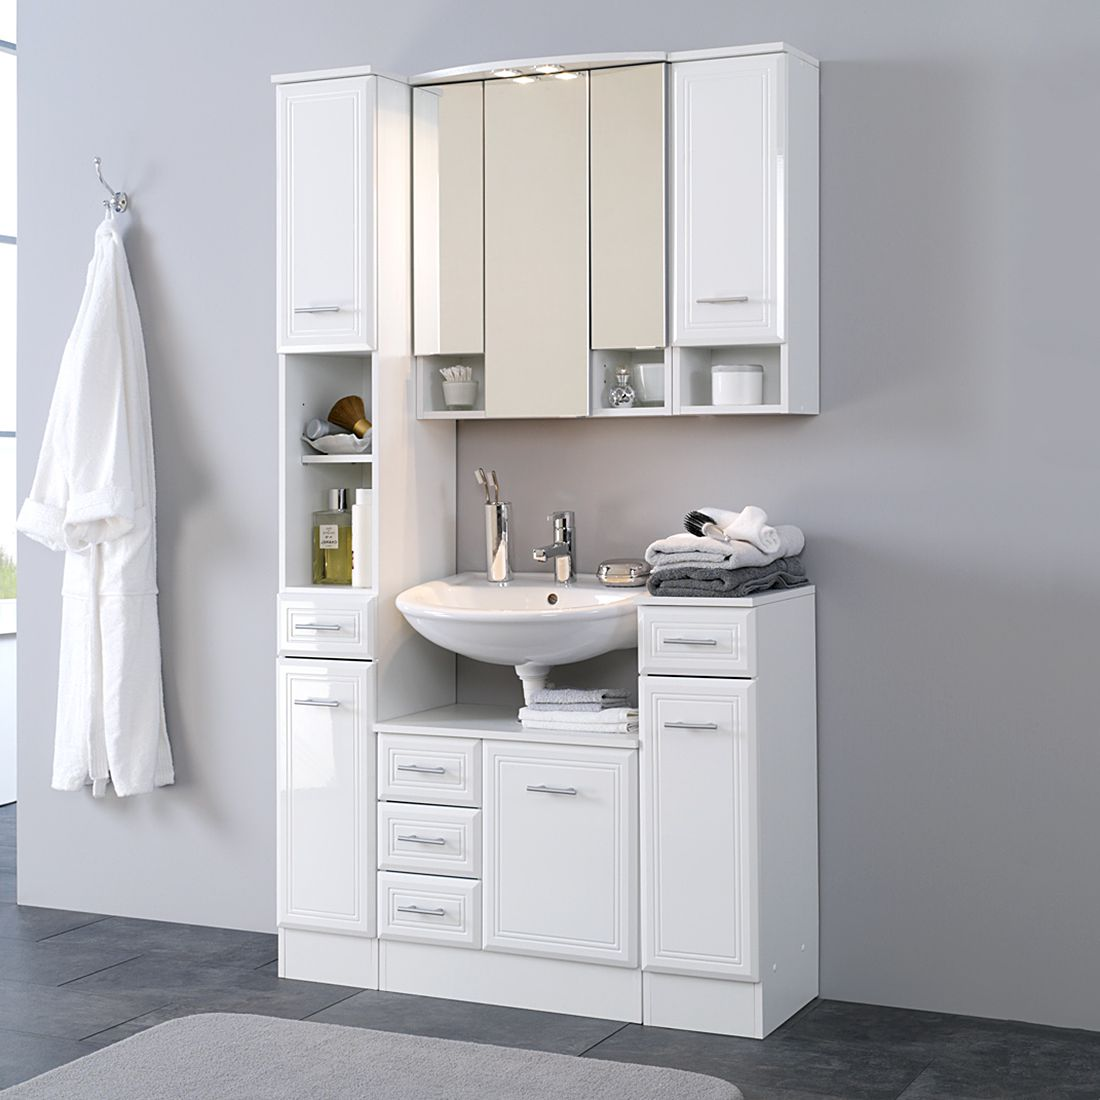 Home 24 - Ensemble de meubles, 5 éléments poseidon - blanc, giessbach